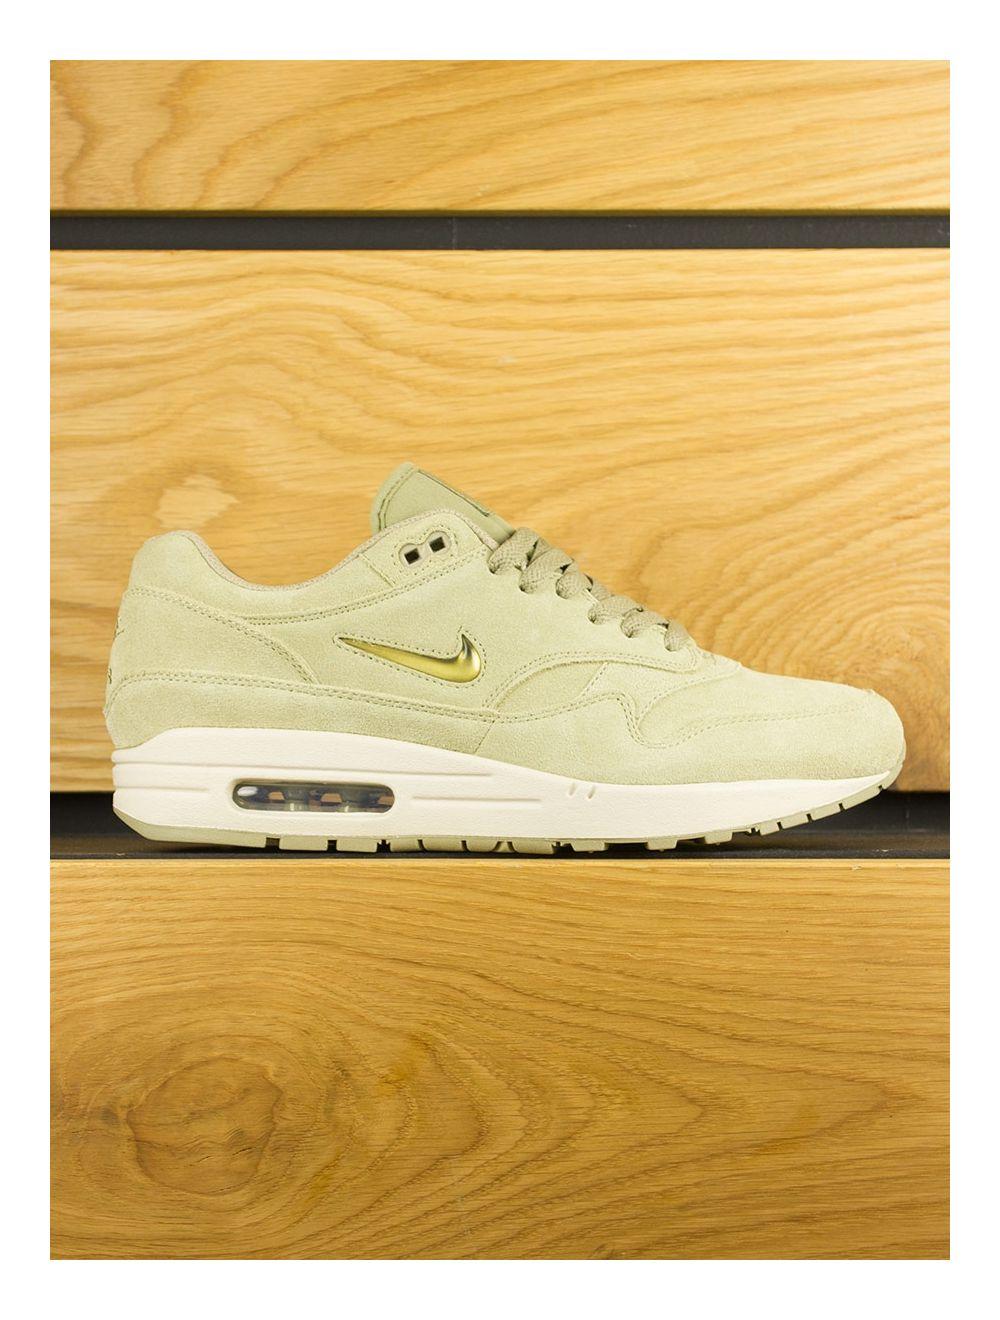 Nike Air Max 1 Premium SC 'Jewel' Neutral Olive Metallic Gold